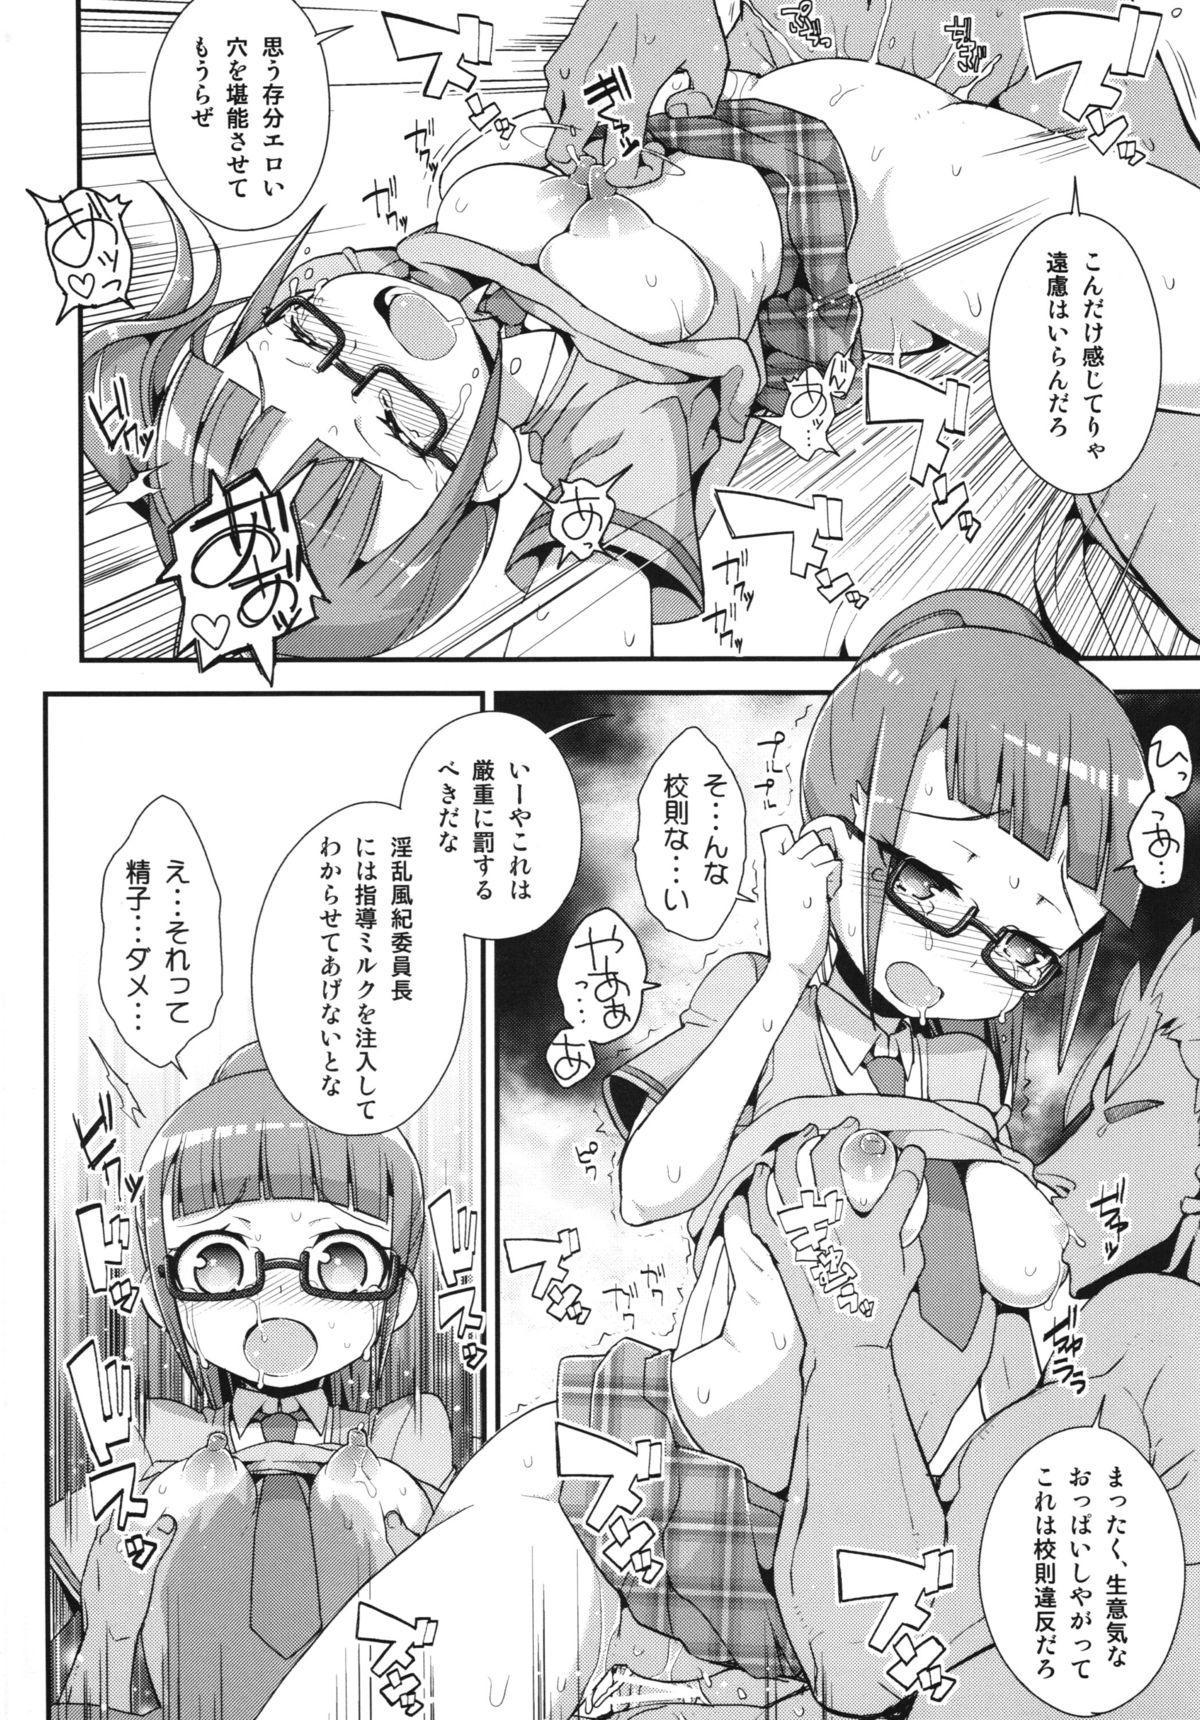 Kashikomax! Ni! + Paper 13